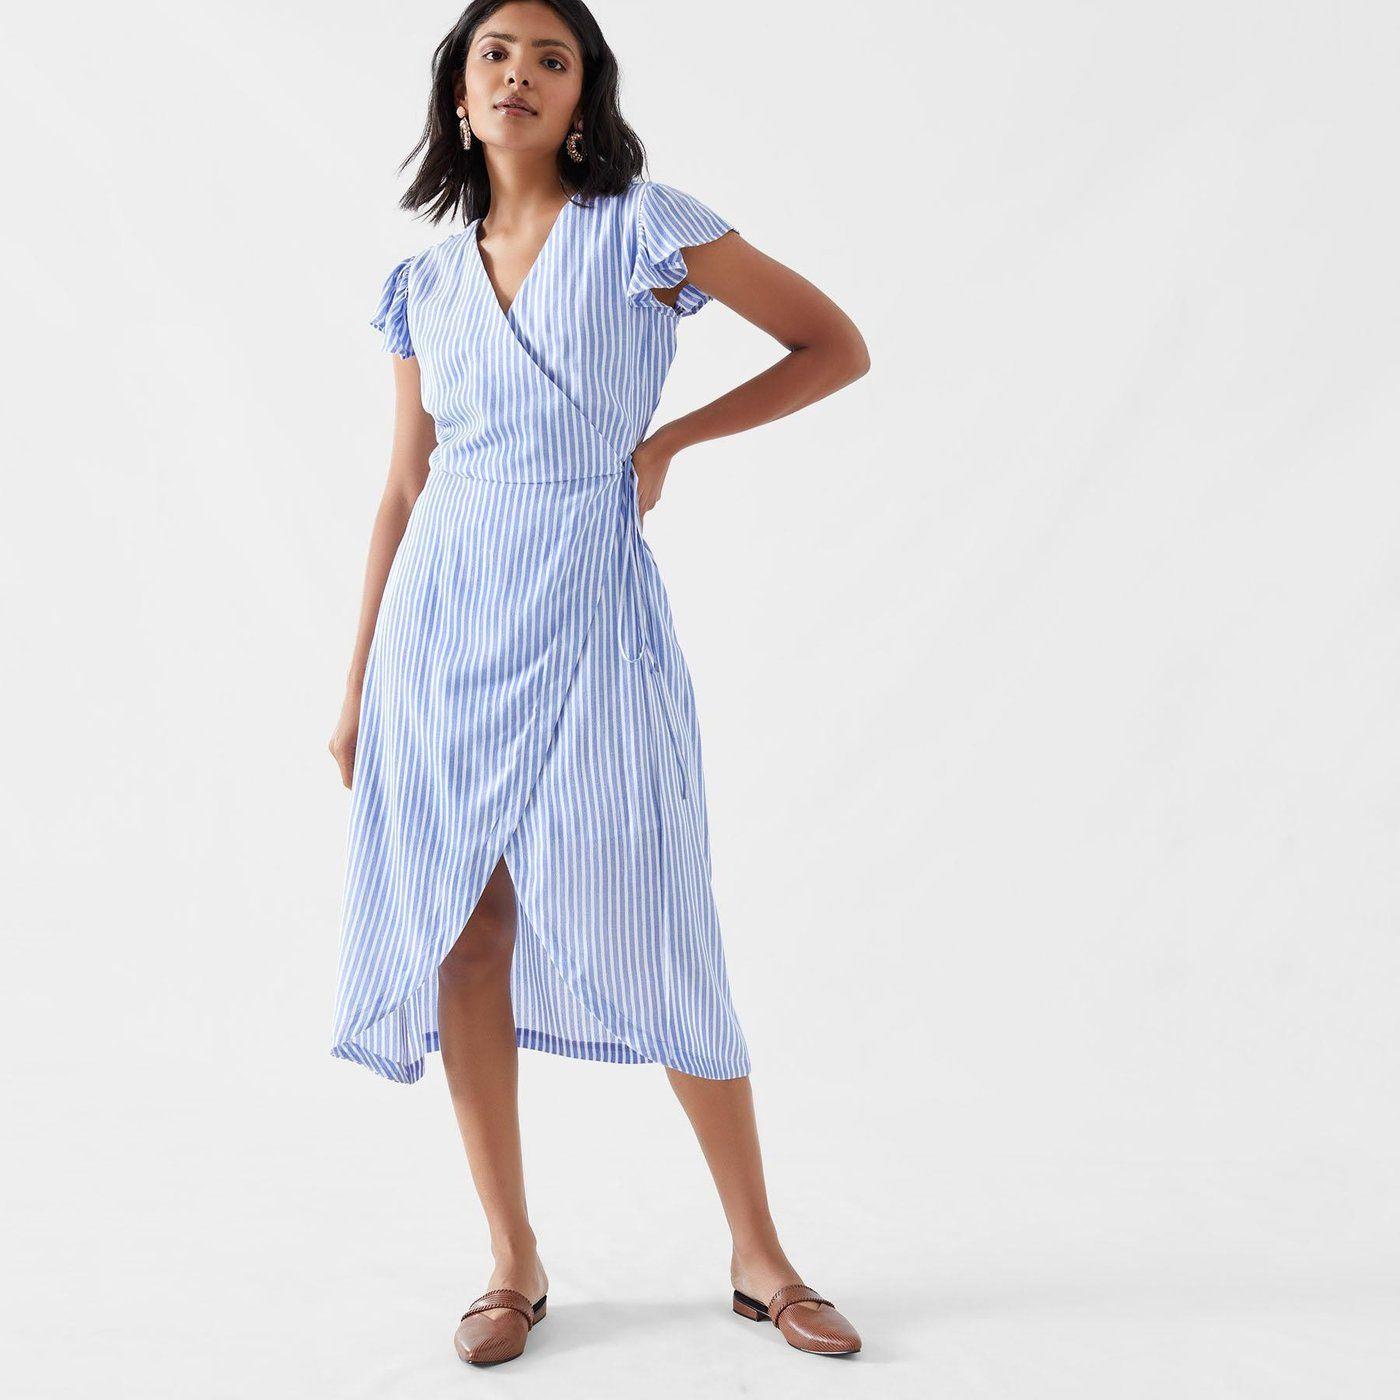 Ocean Striped Wrap Dress Wrap Dress Dresses Blue Striped Dress [ 1400 x 1400 Pixel ]